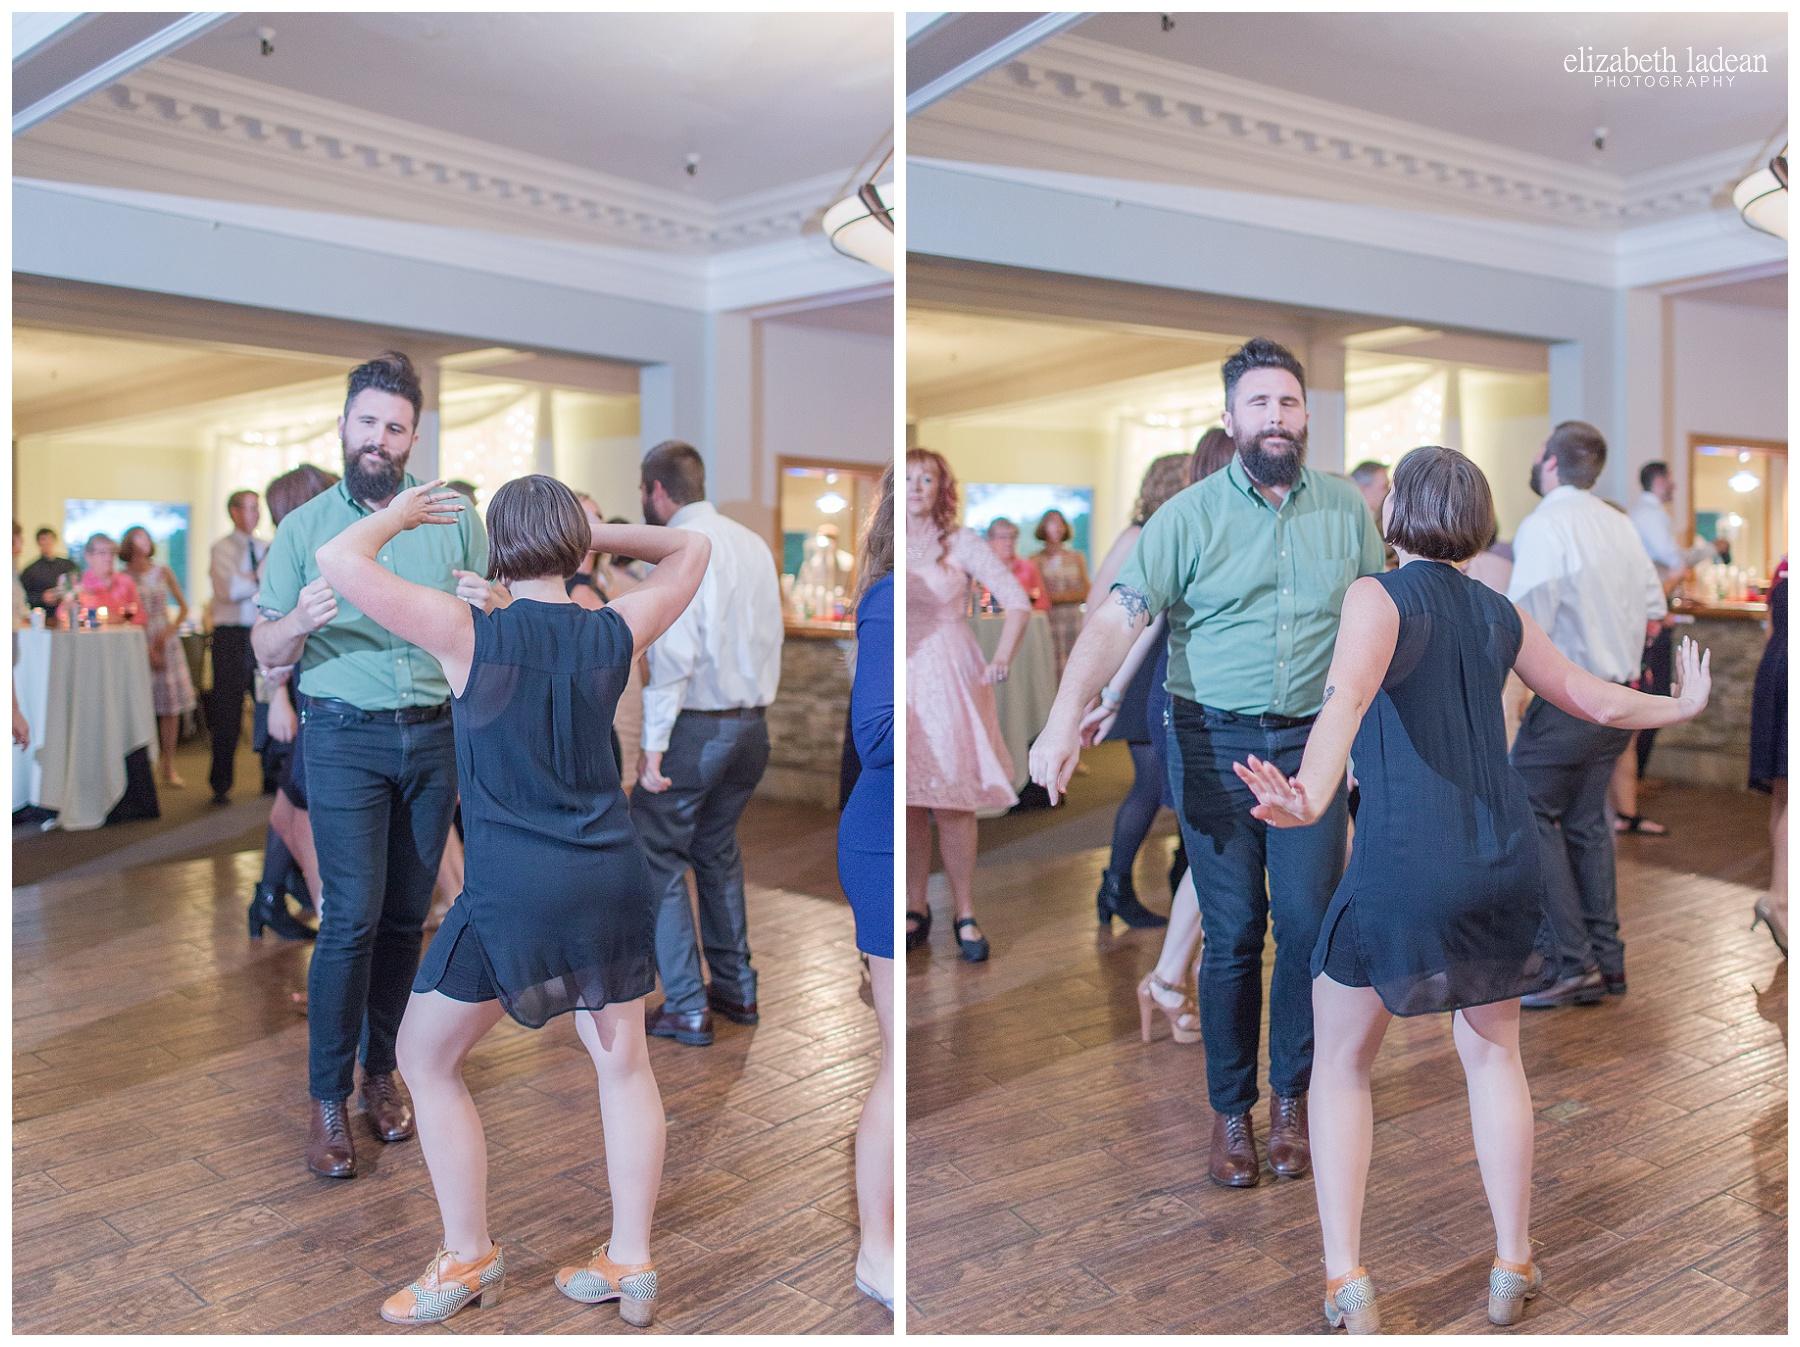 Hillcrest-Country-Club-Kansas-City-Wedding-Photography-E+J-0520-Elizabeth-Ladean-Photography-photo_0894.jpg